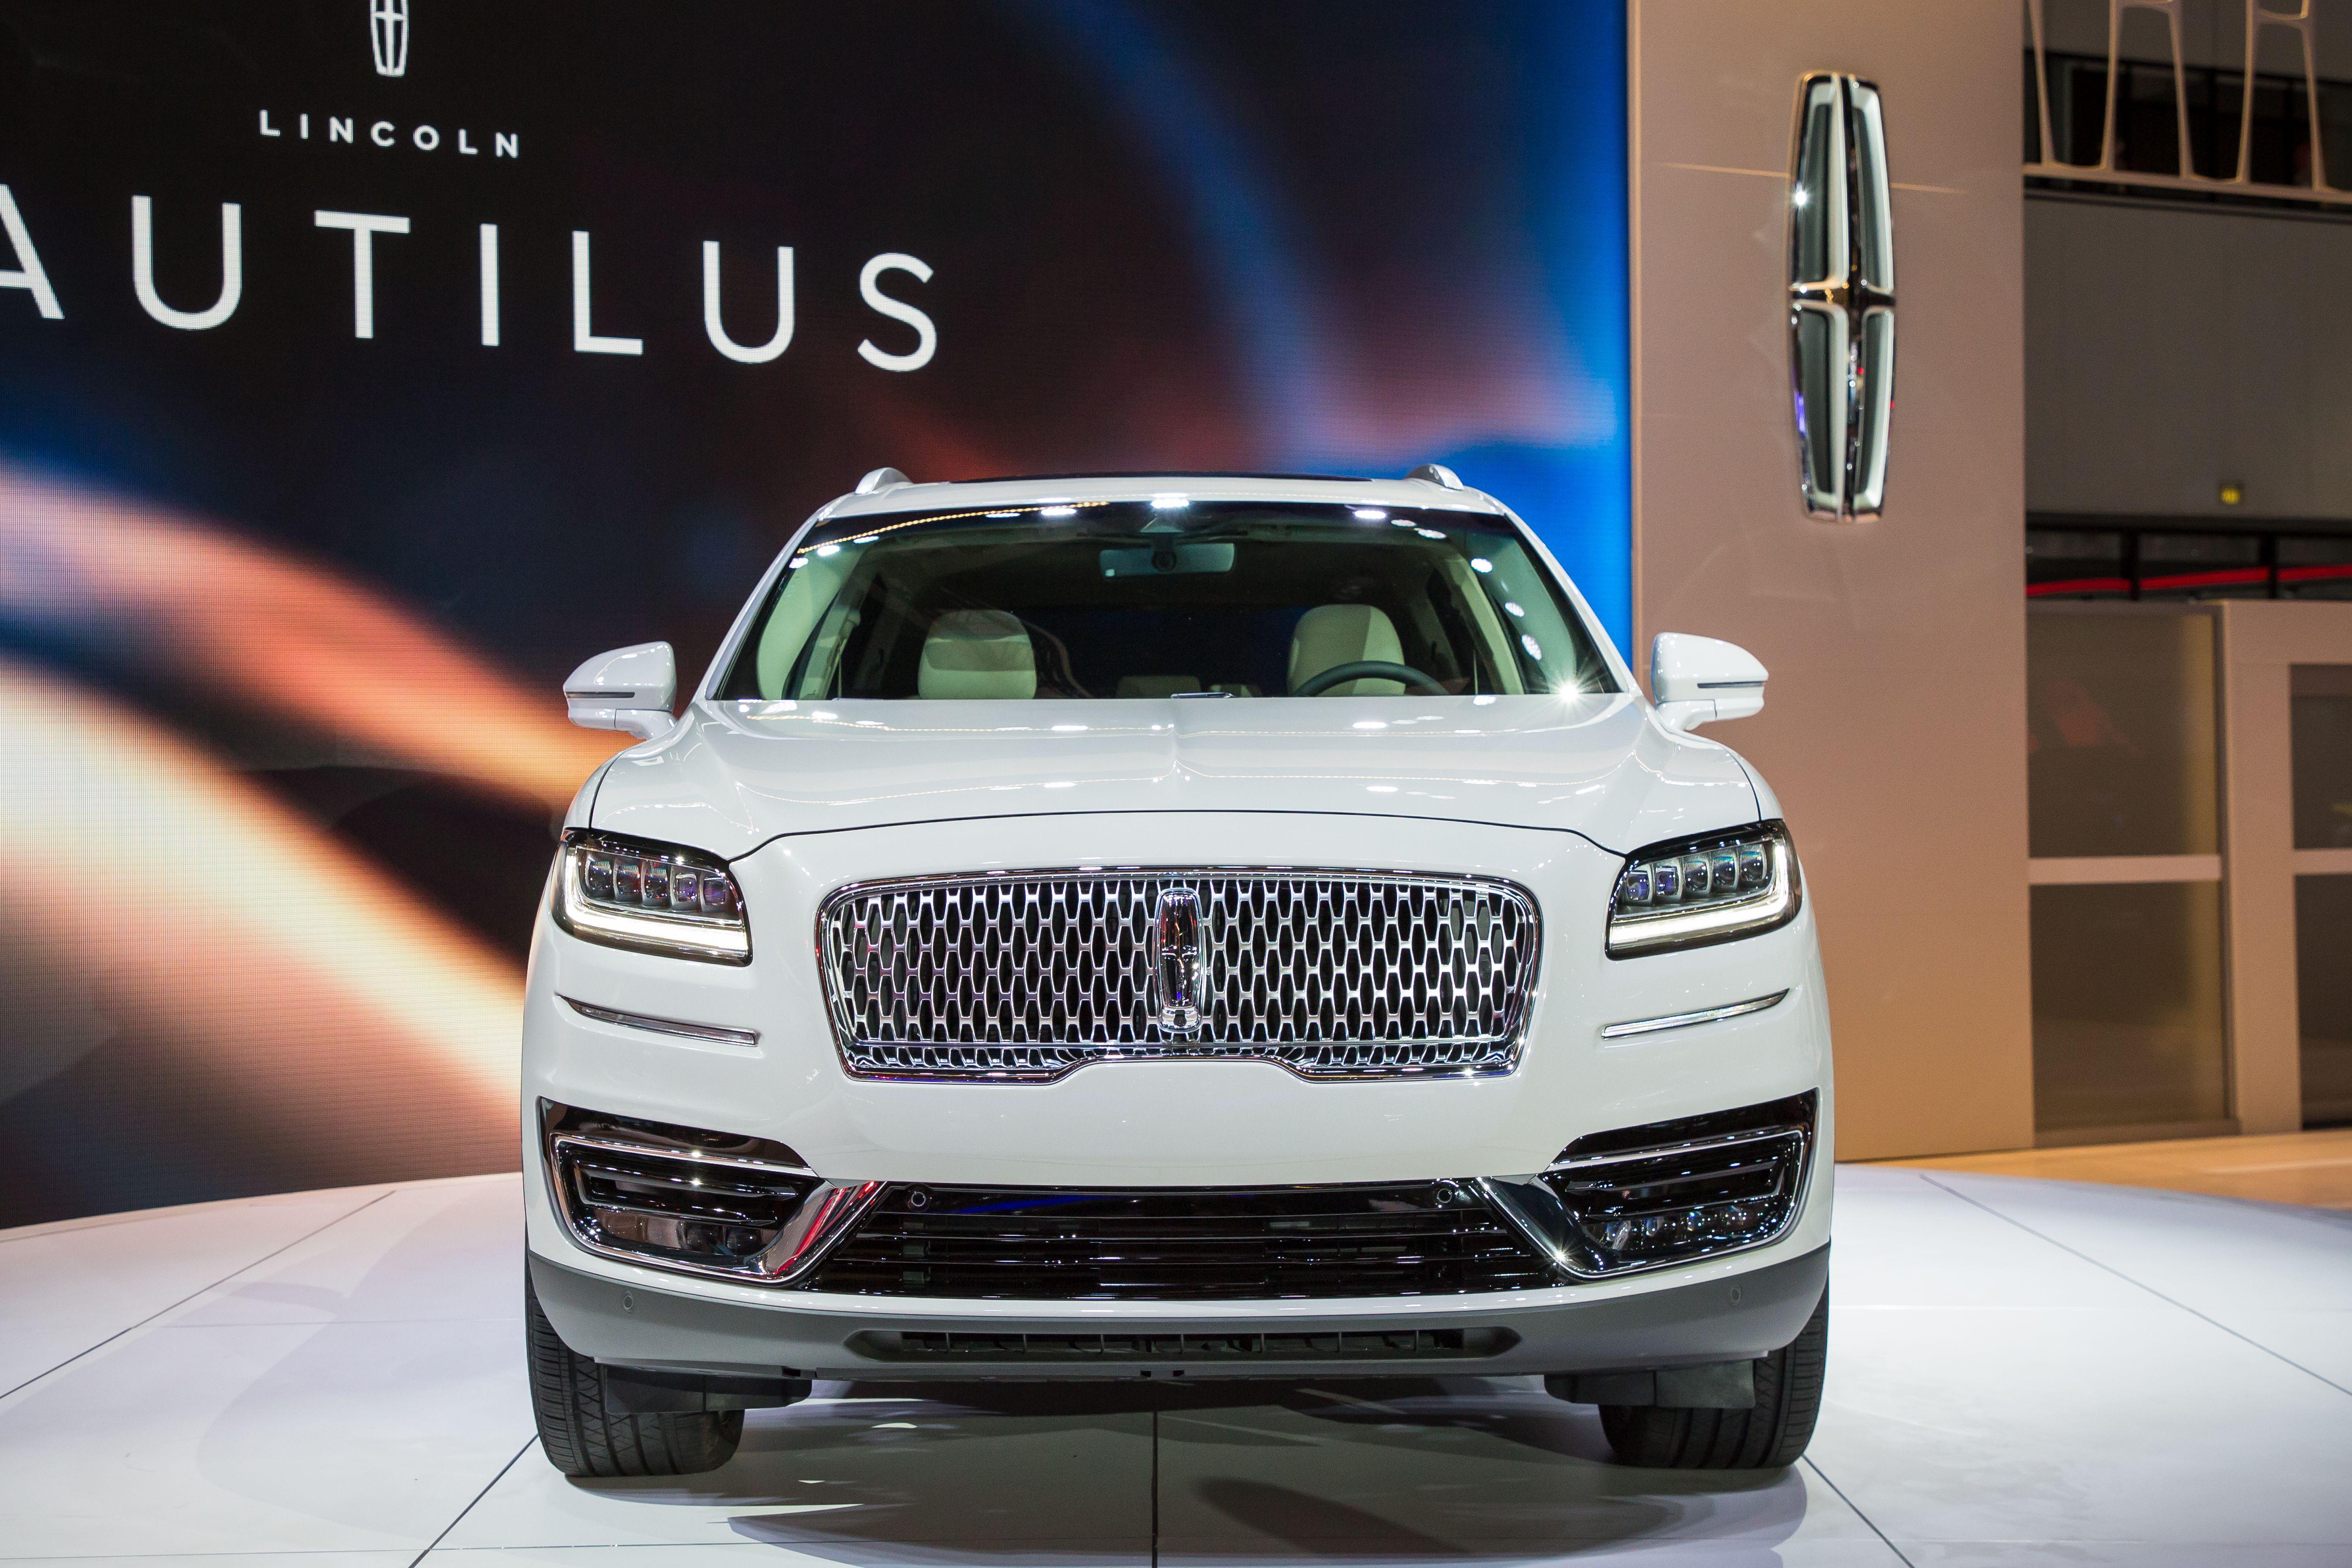 Lincoln Nautilus (MKX facelift) (VS) - AutoWeek.nl